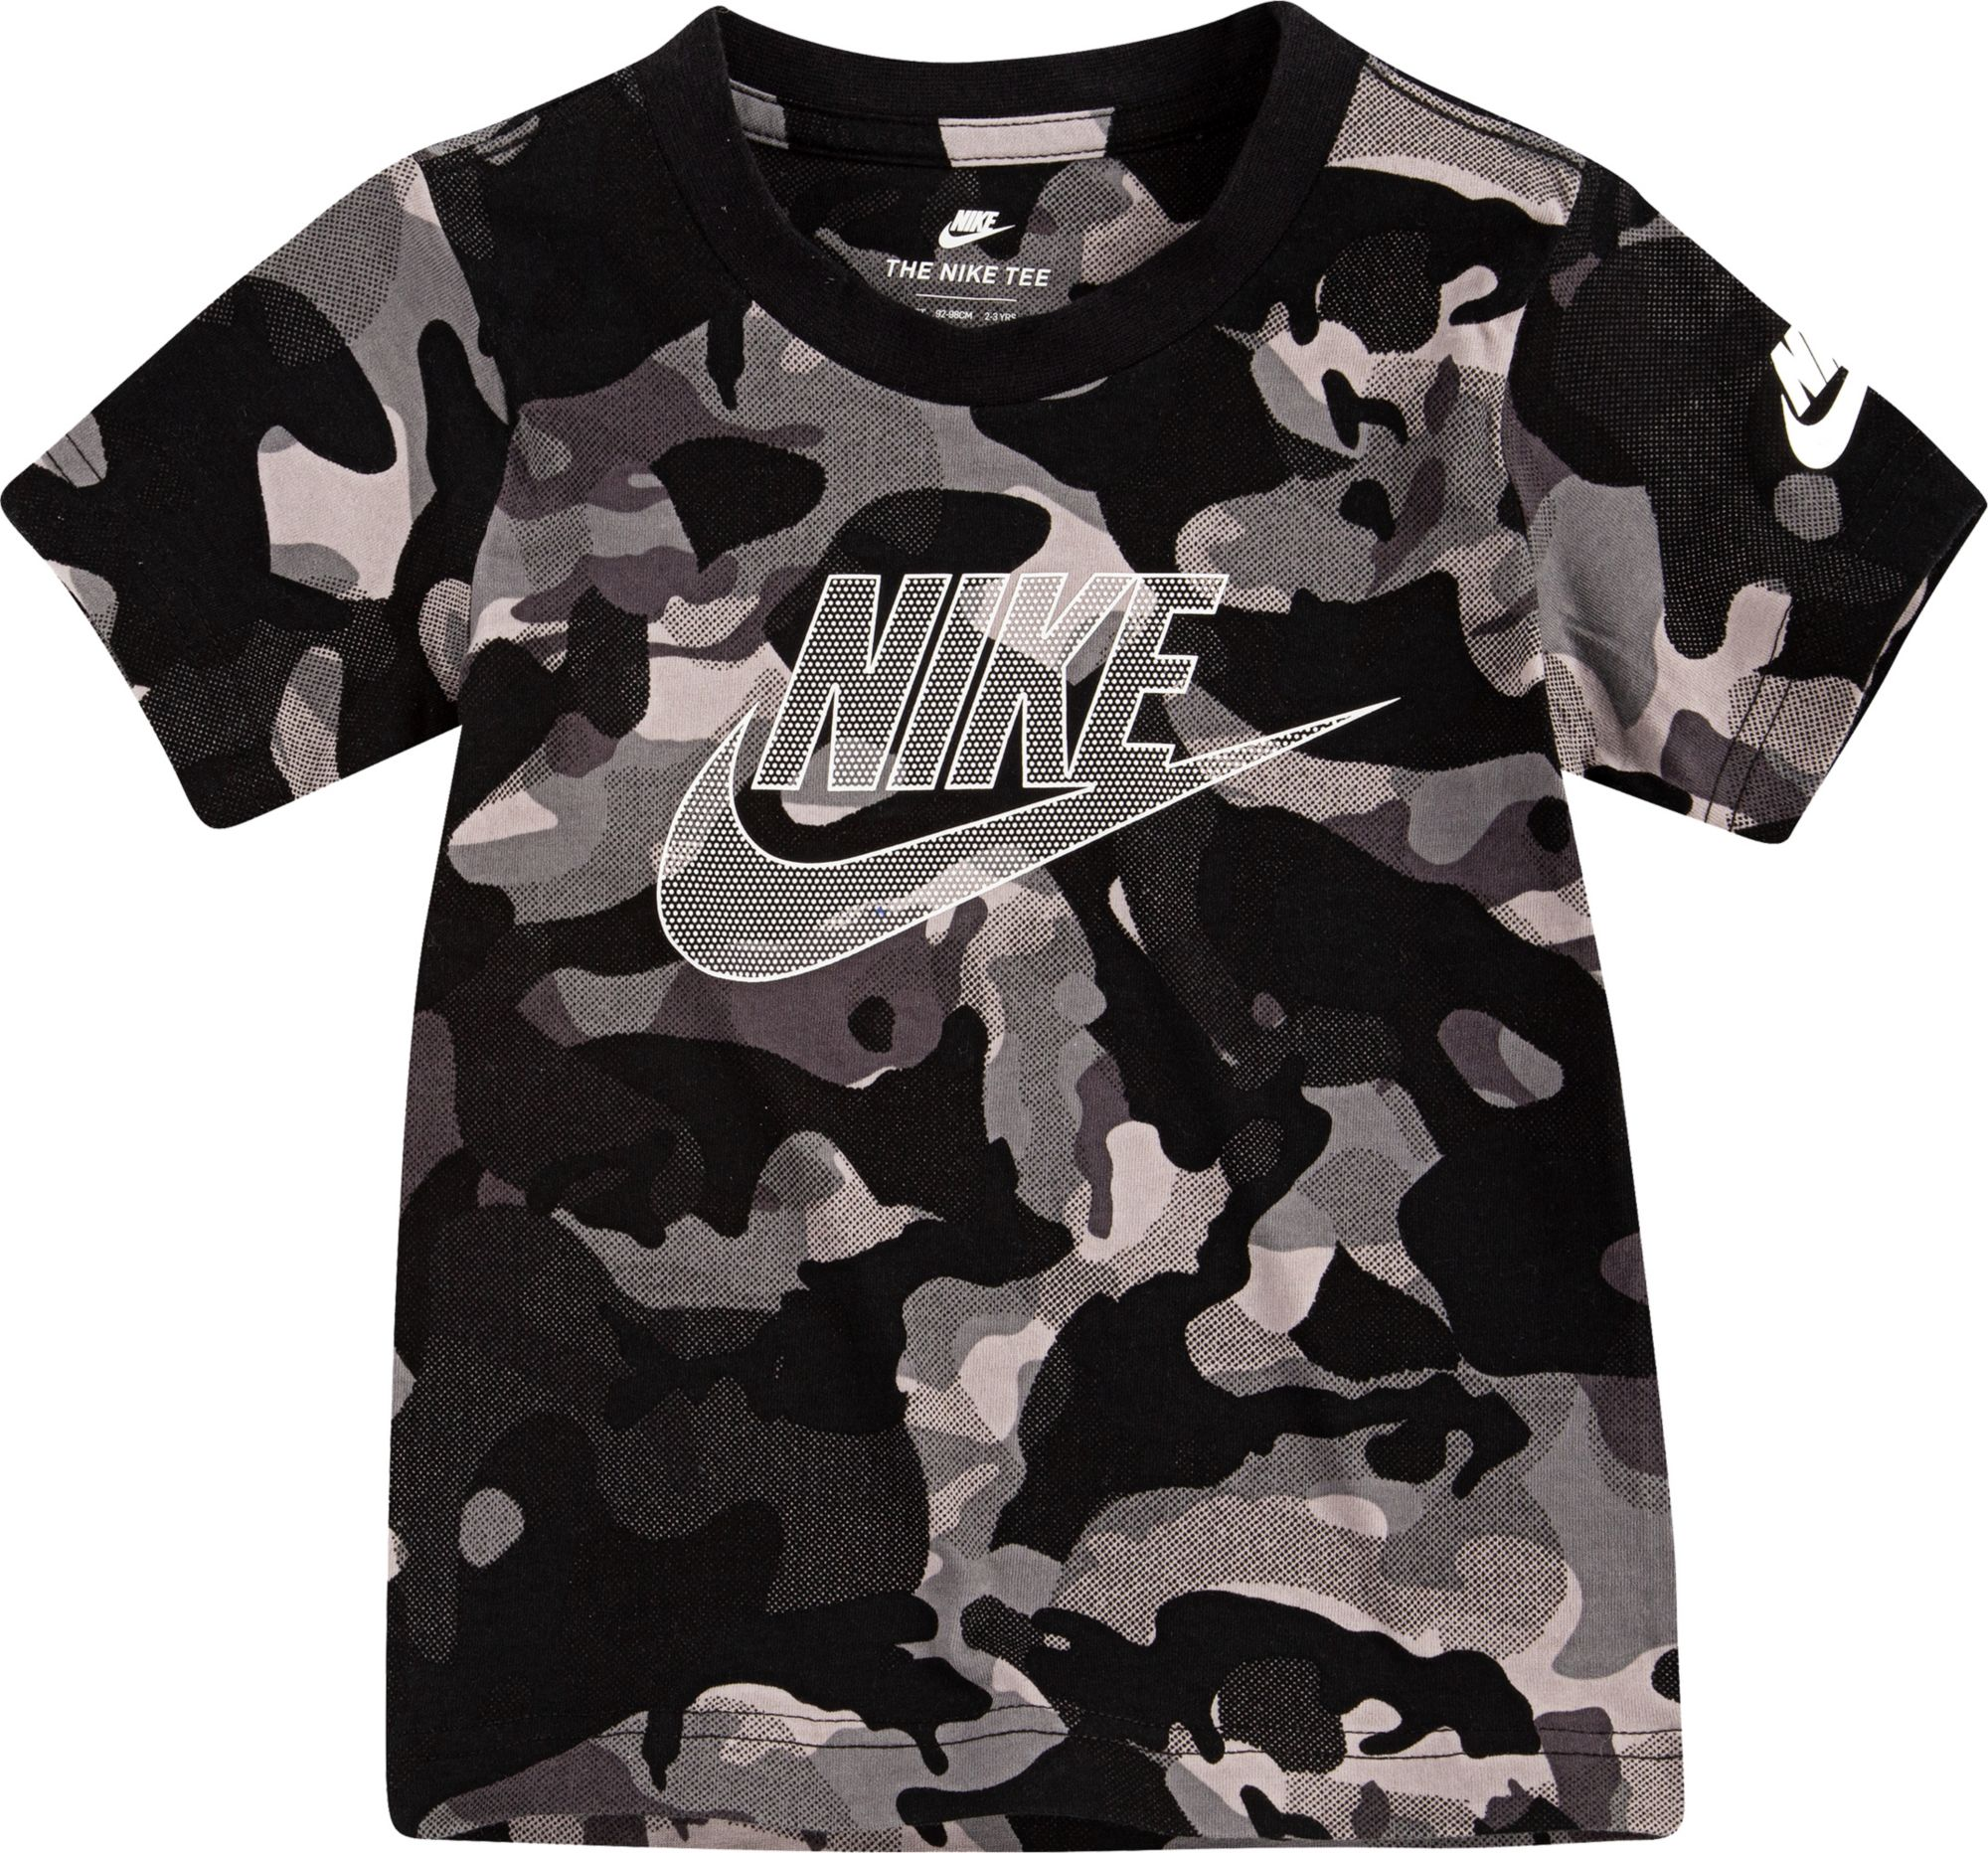 Nike Toddler Boys' Camo Graphic T-Shirt, Boy's, Size: 2T, Black thumbnail